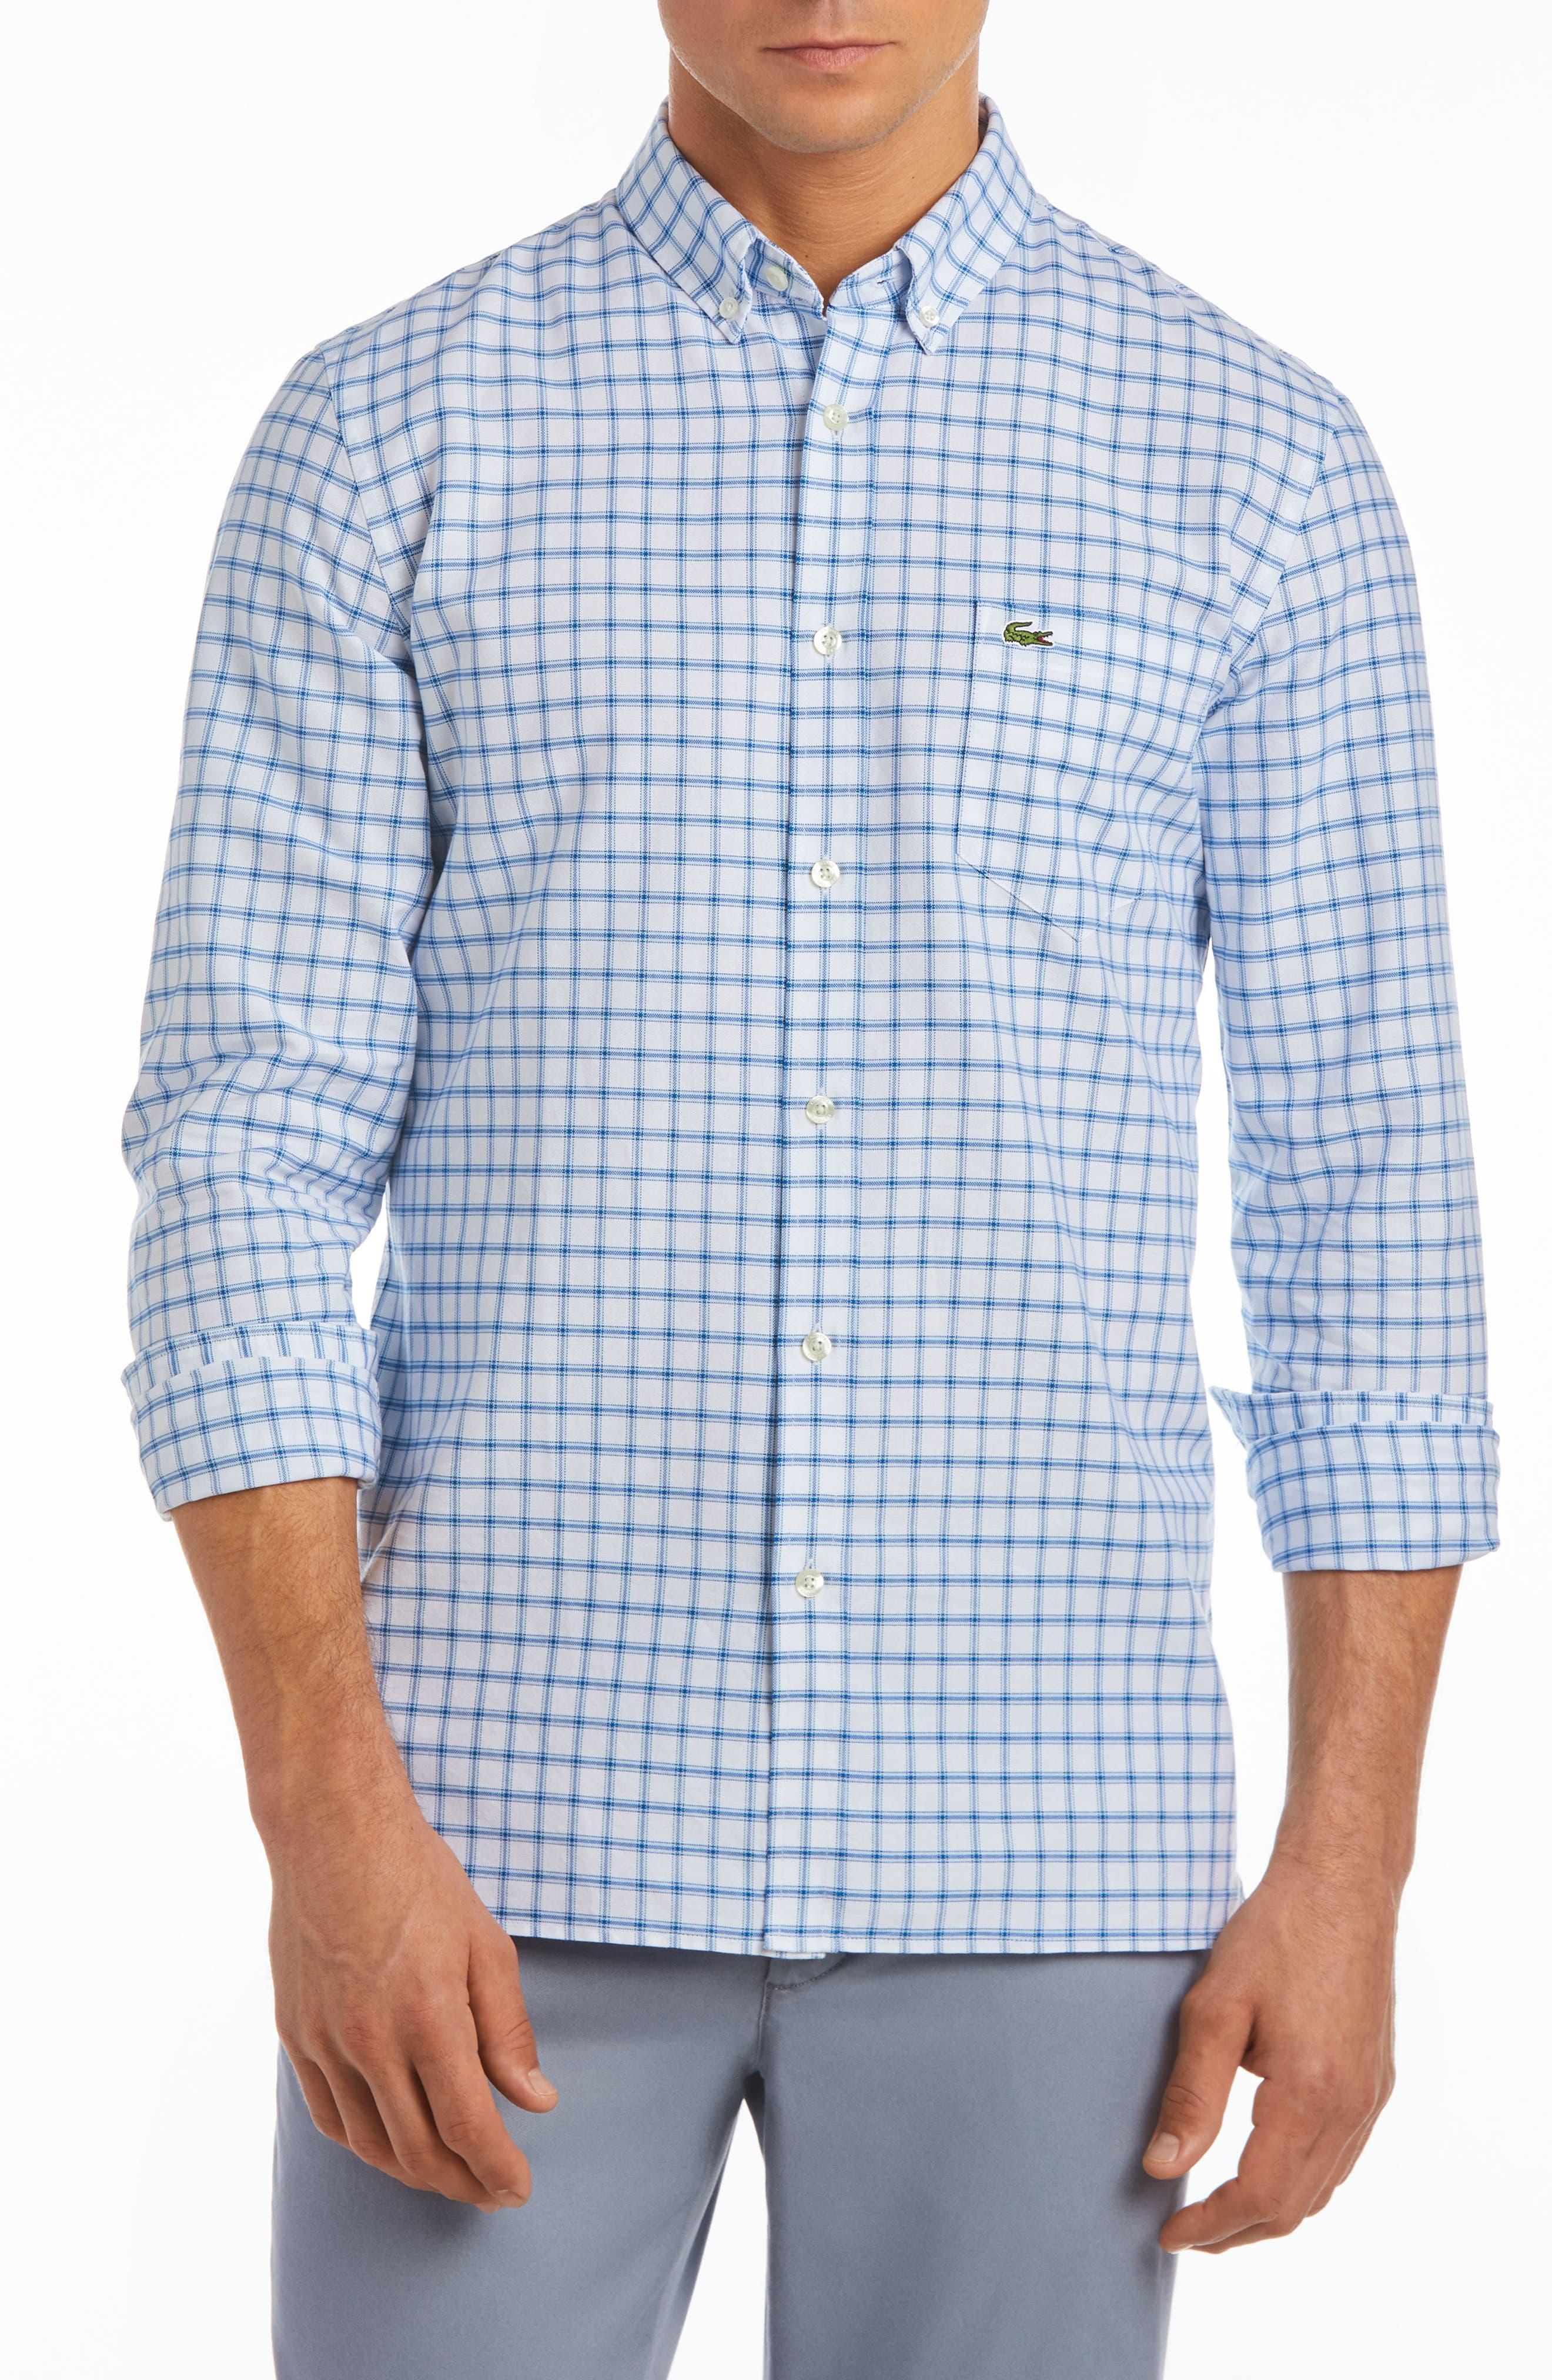 Alternate Image 1 Selected - Lacoste Slim Fit Grid Cotton Sport Shirt